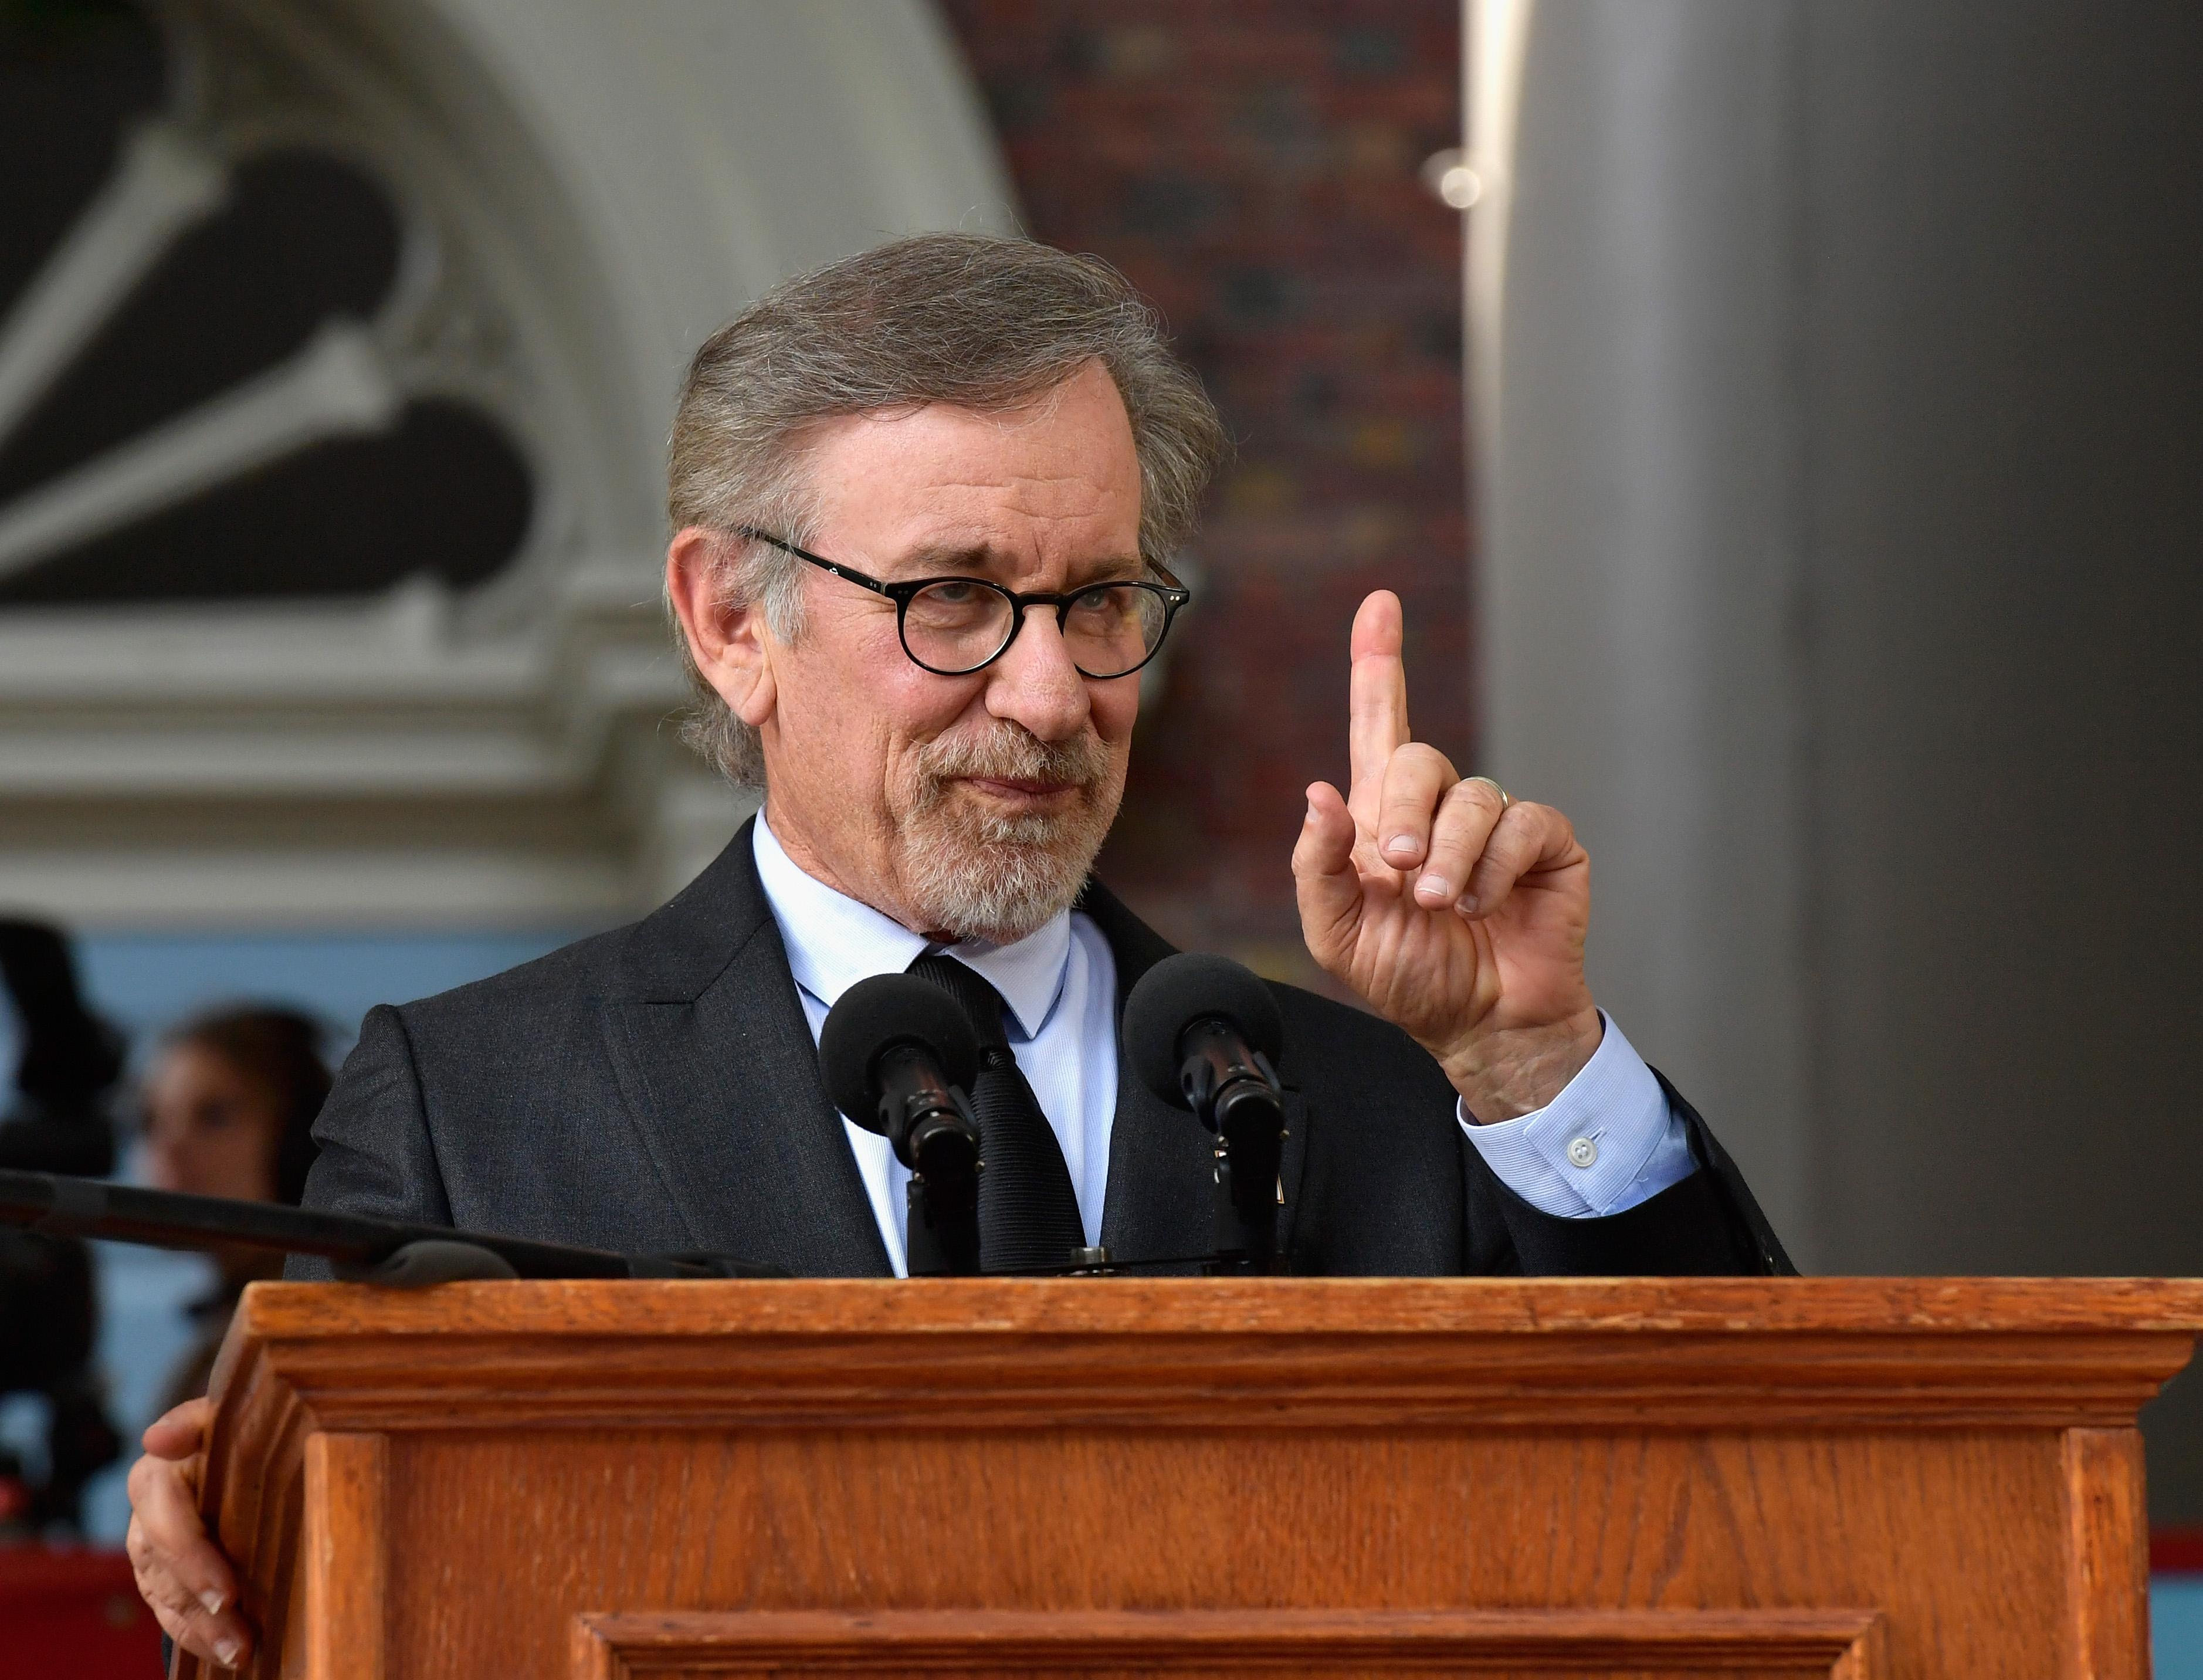 Steven Spielberg Speaks at 2016 Harvard Commencement Day